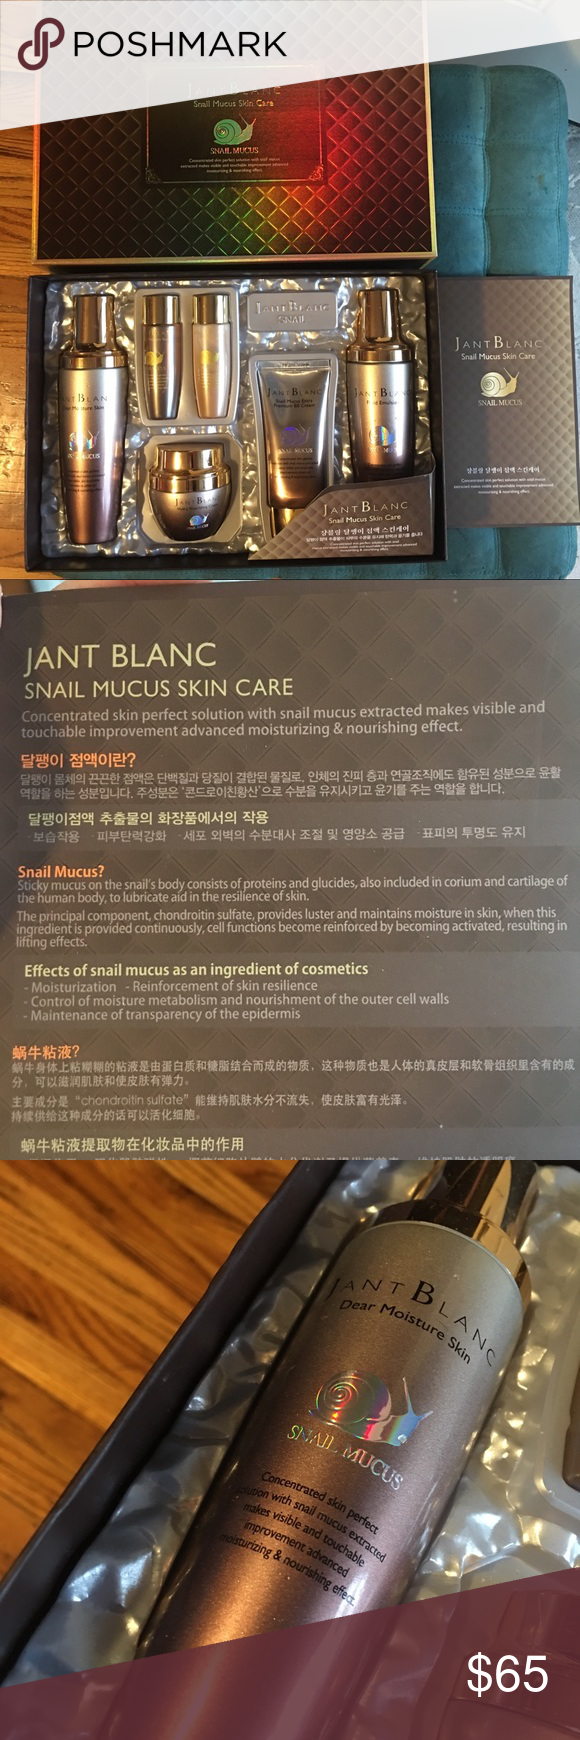 Snail Mucus Korean Skin Care Set In 2020 Skincare Set Korean Skincare Mucus